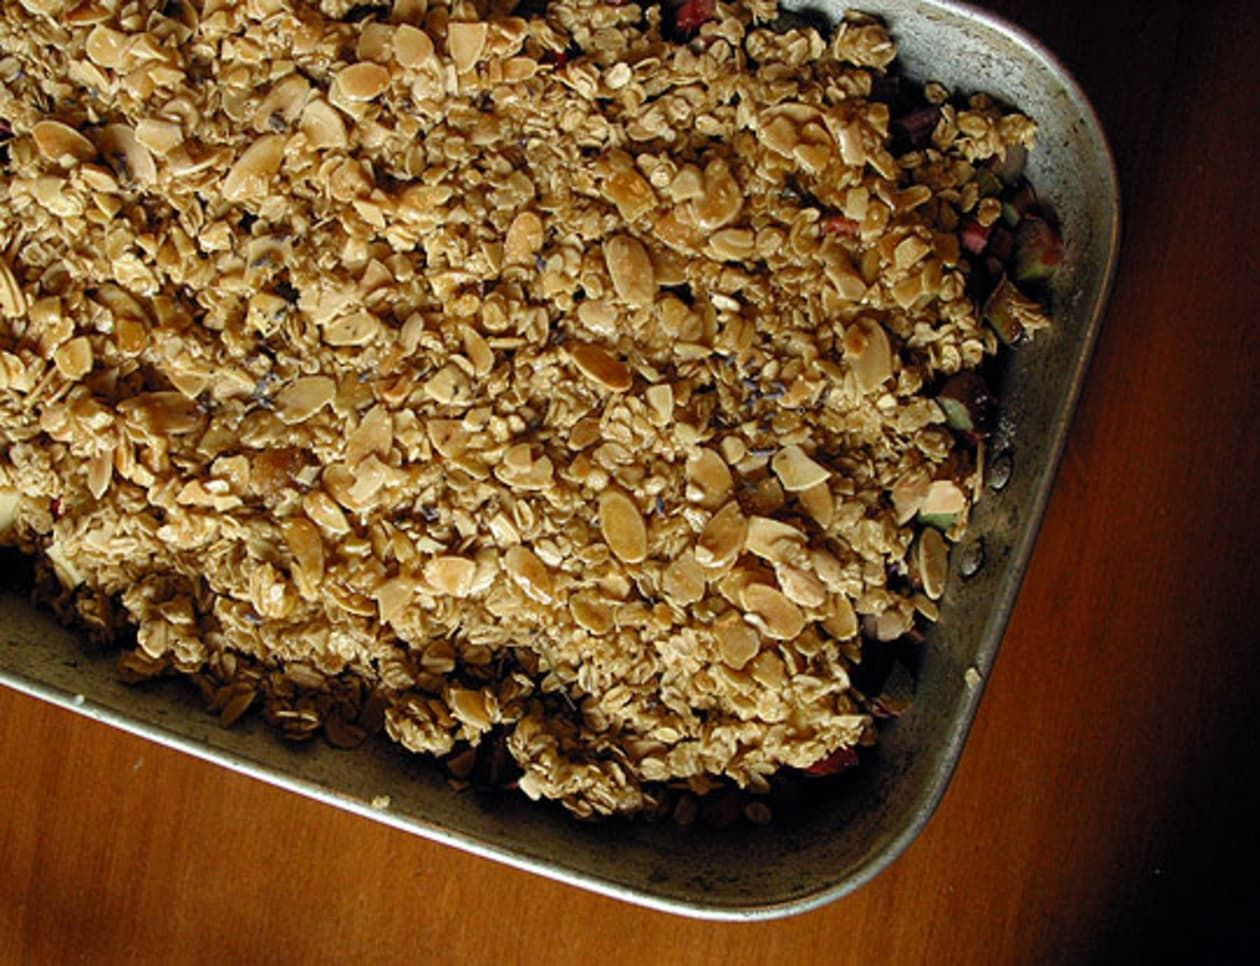 Basic oat crumble topping for fruit crispy version